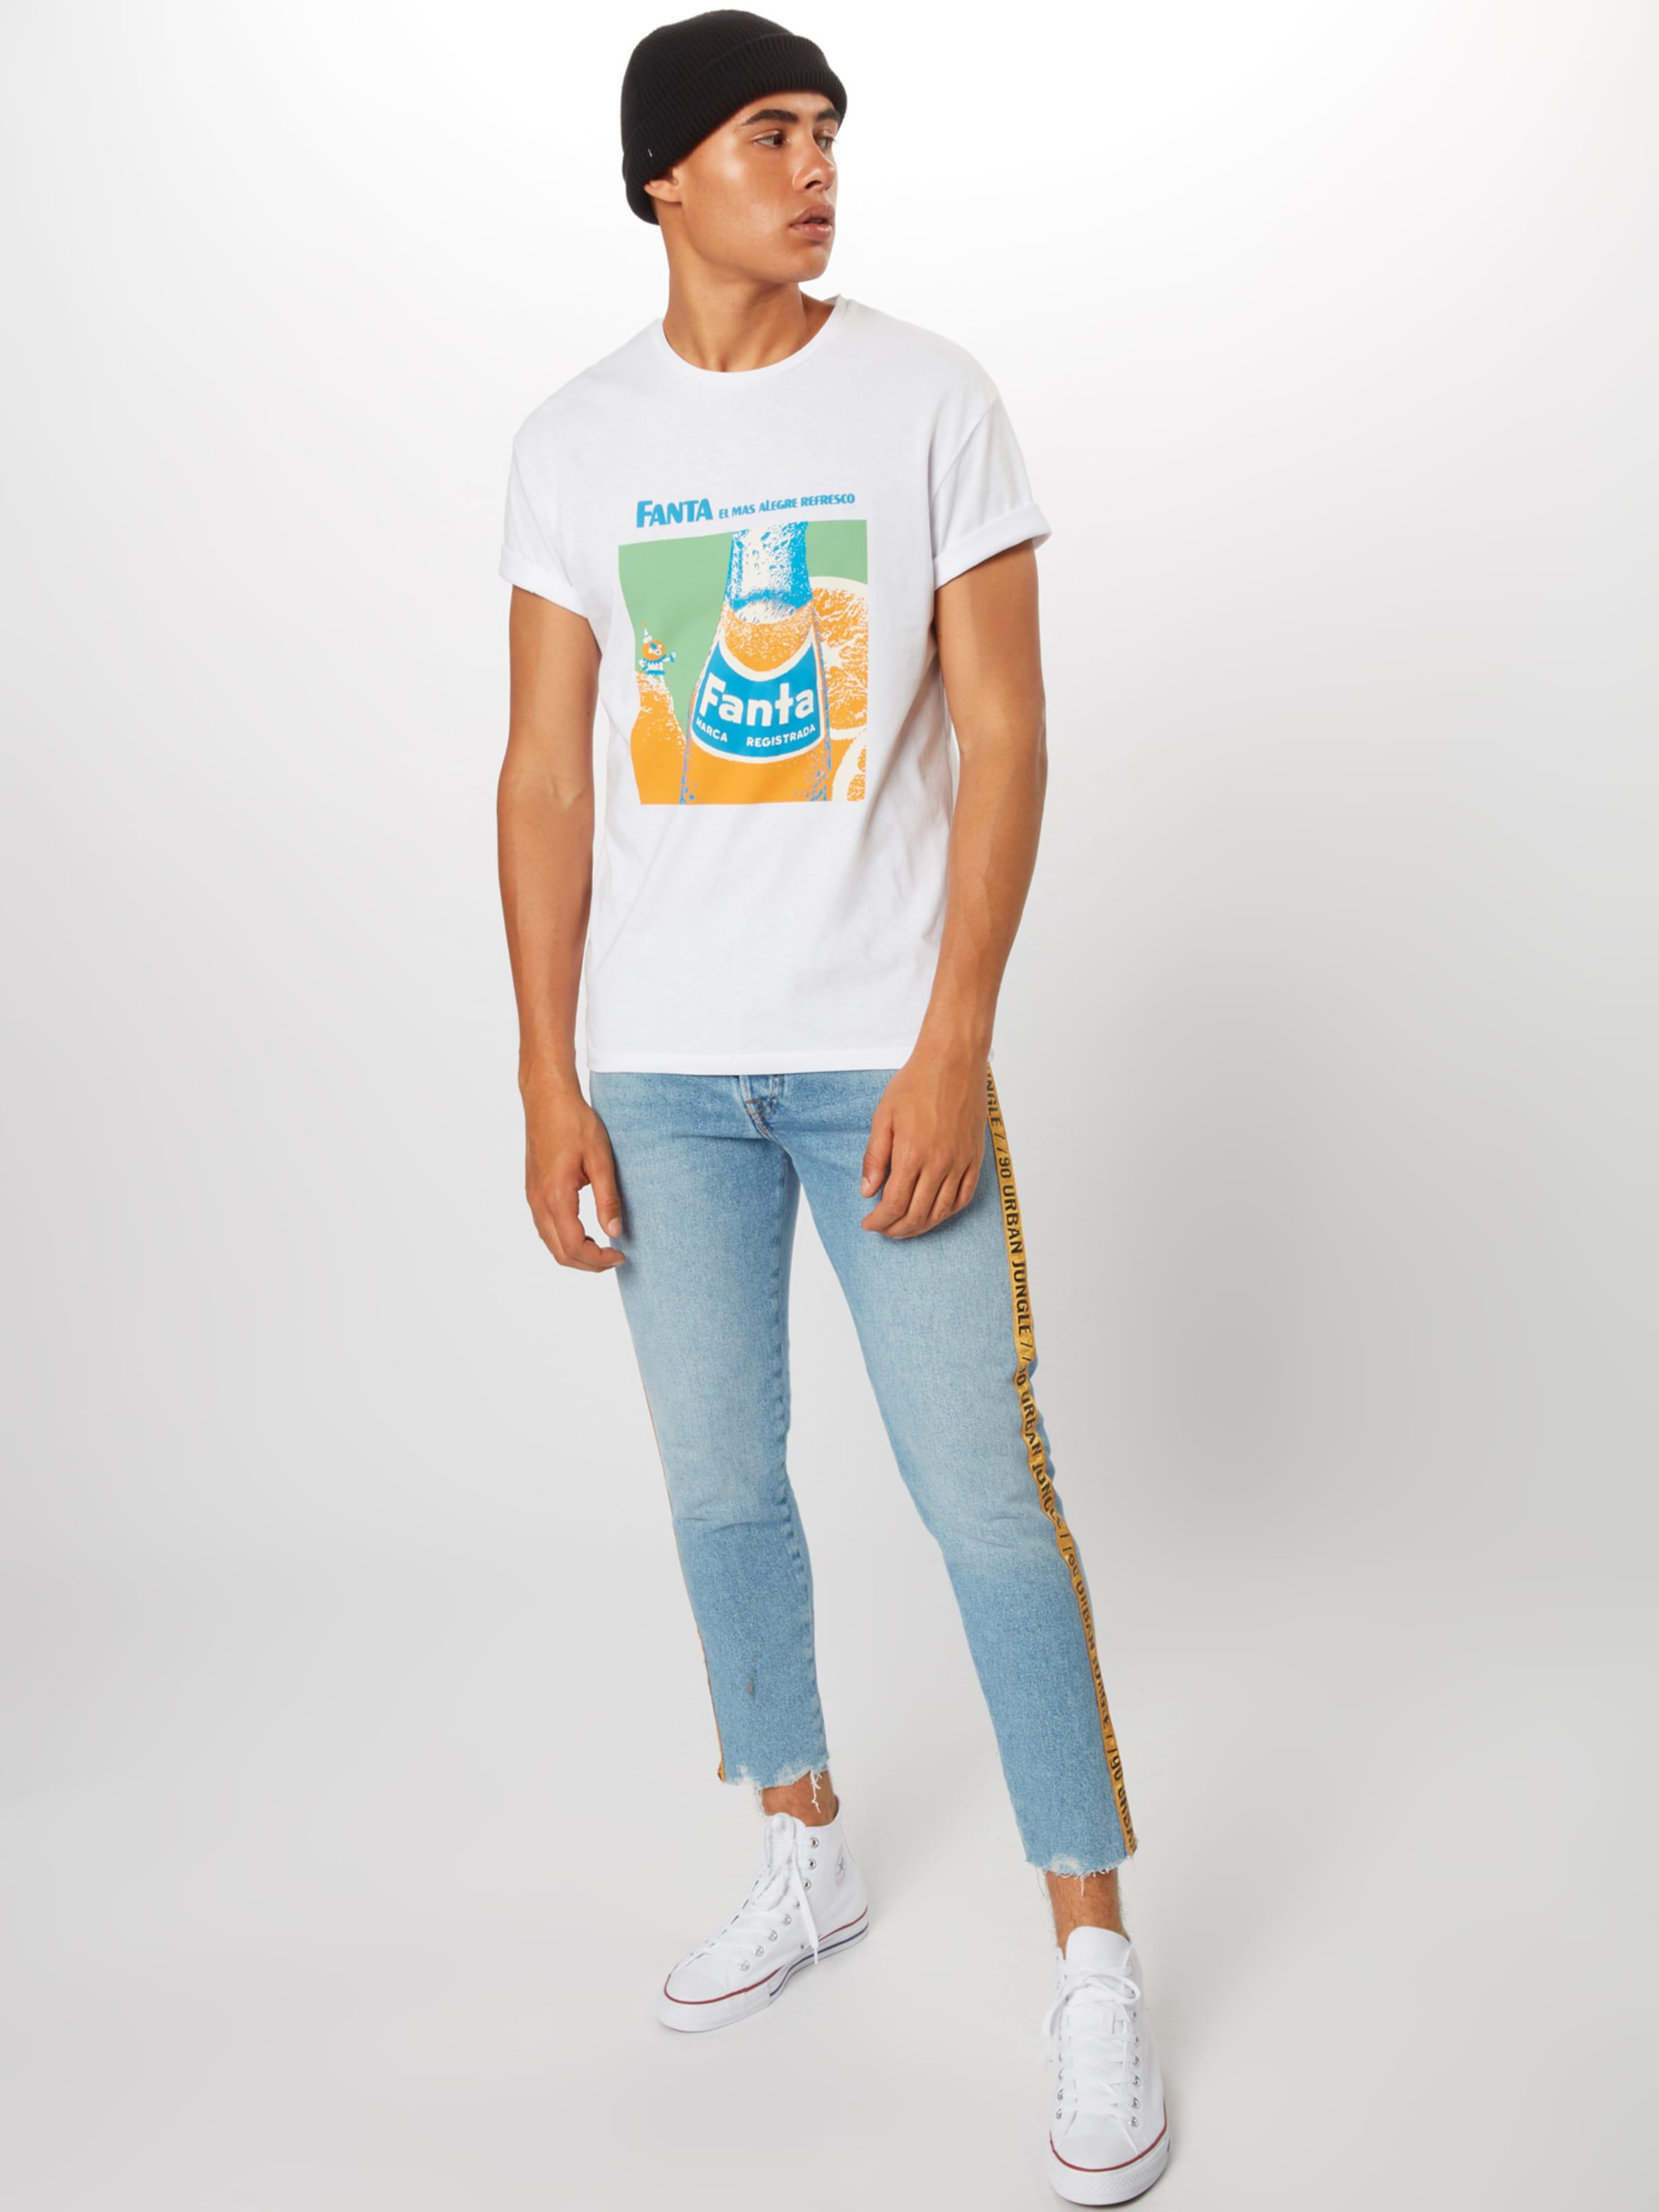 shirt 'fanta' T BleuVert Jones Orange Jackamp; En Blanc 76gYfyvb